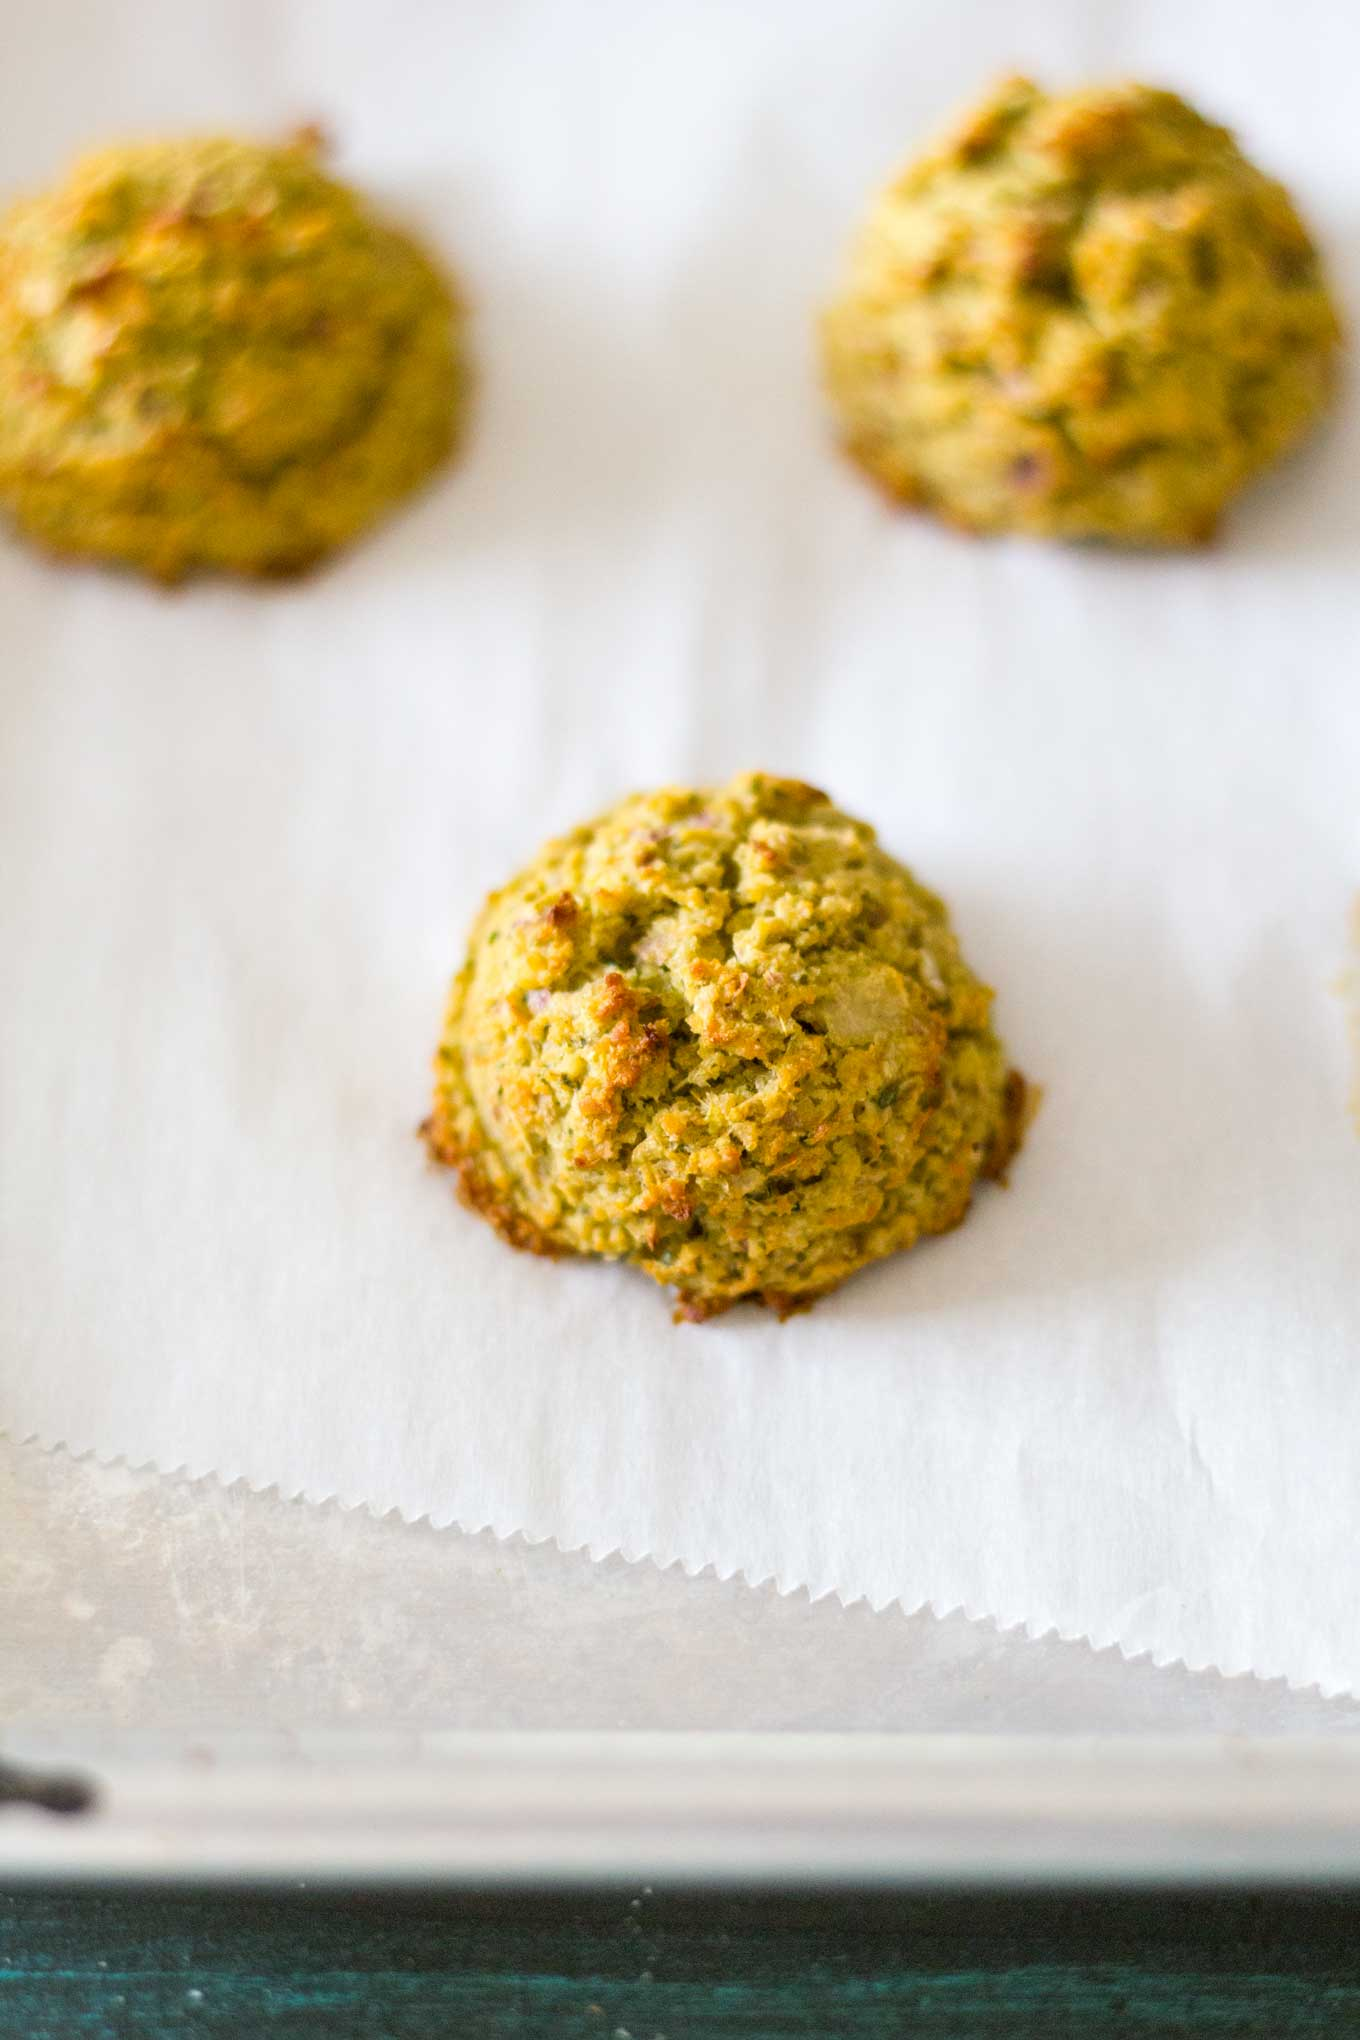 Oven-Baked Falafel on baking sheet after baking | Plant-based | Oil-free | Vegan | Gluten-free | https://eatwithinyourmeans.com/